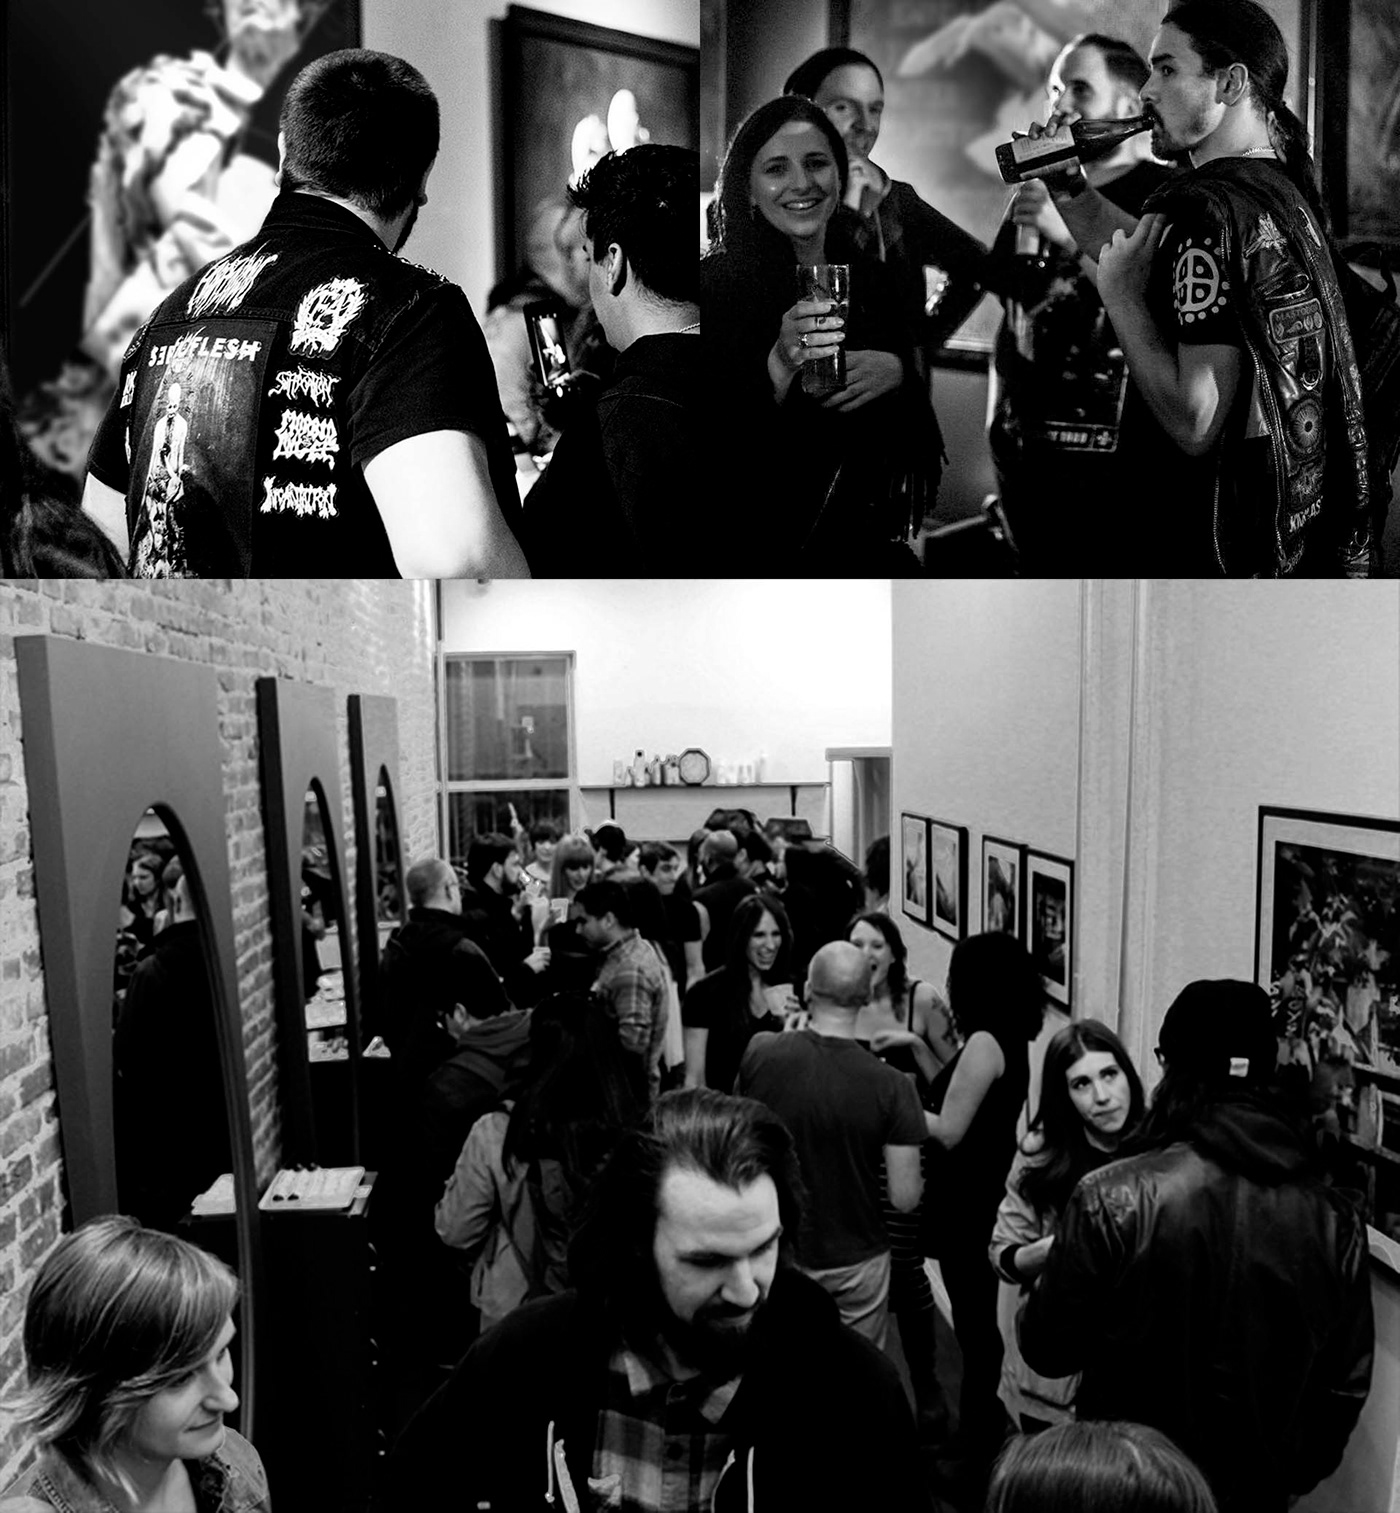 Sanctum tattoo Tattoo Studio graphic design  conference Exhibition  Exhibition Design  poster Poster Design Identity Design